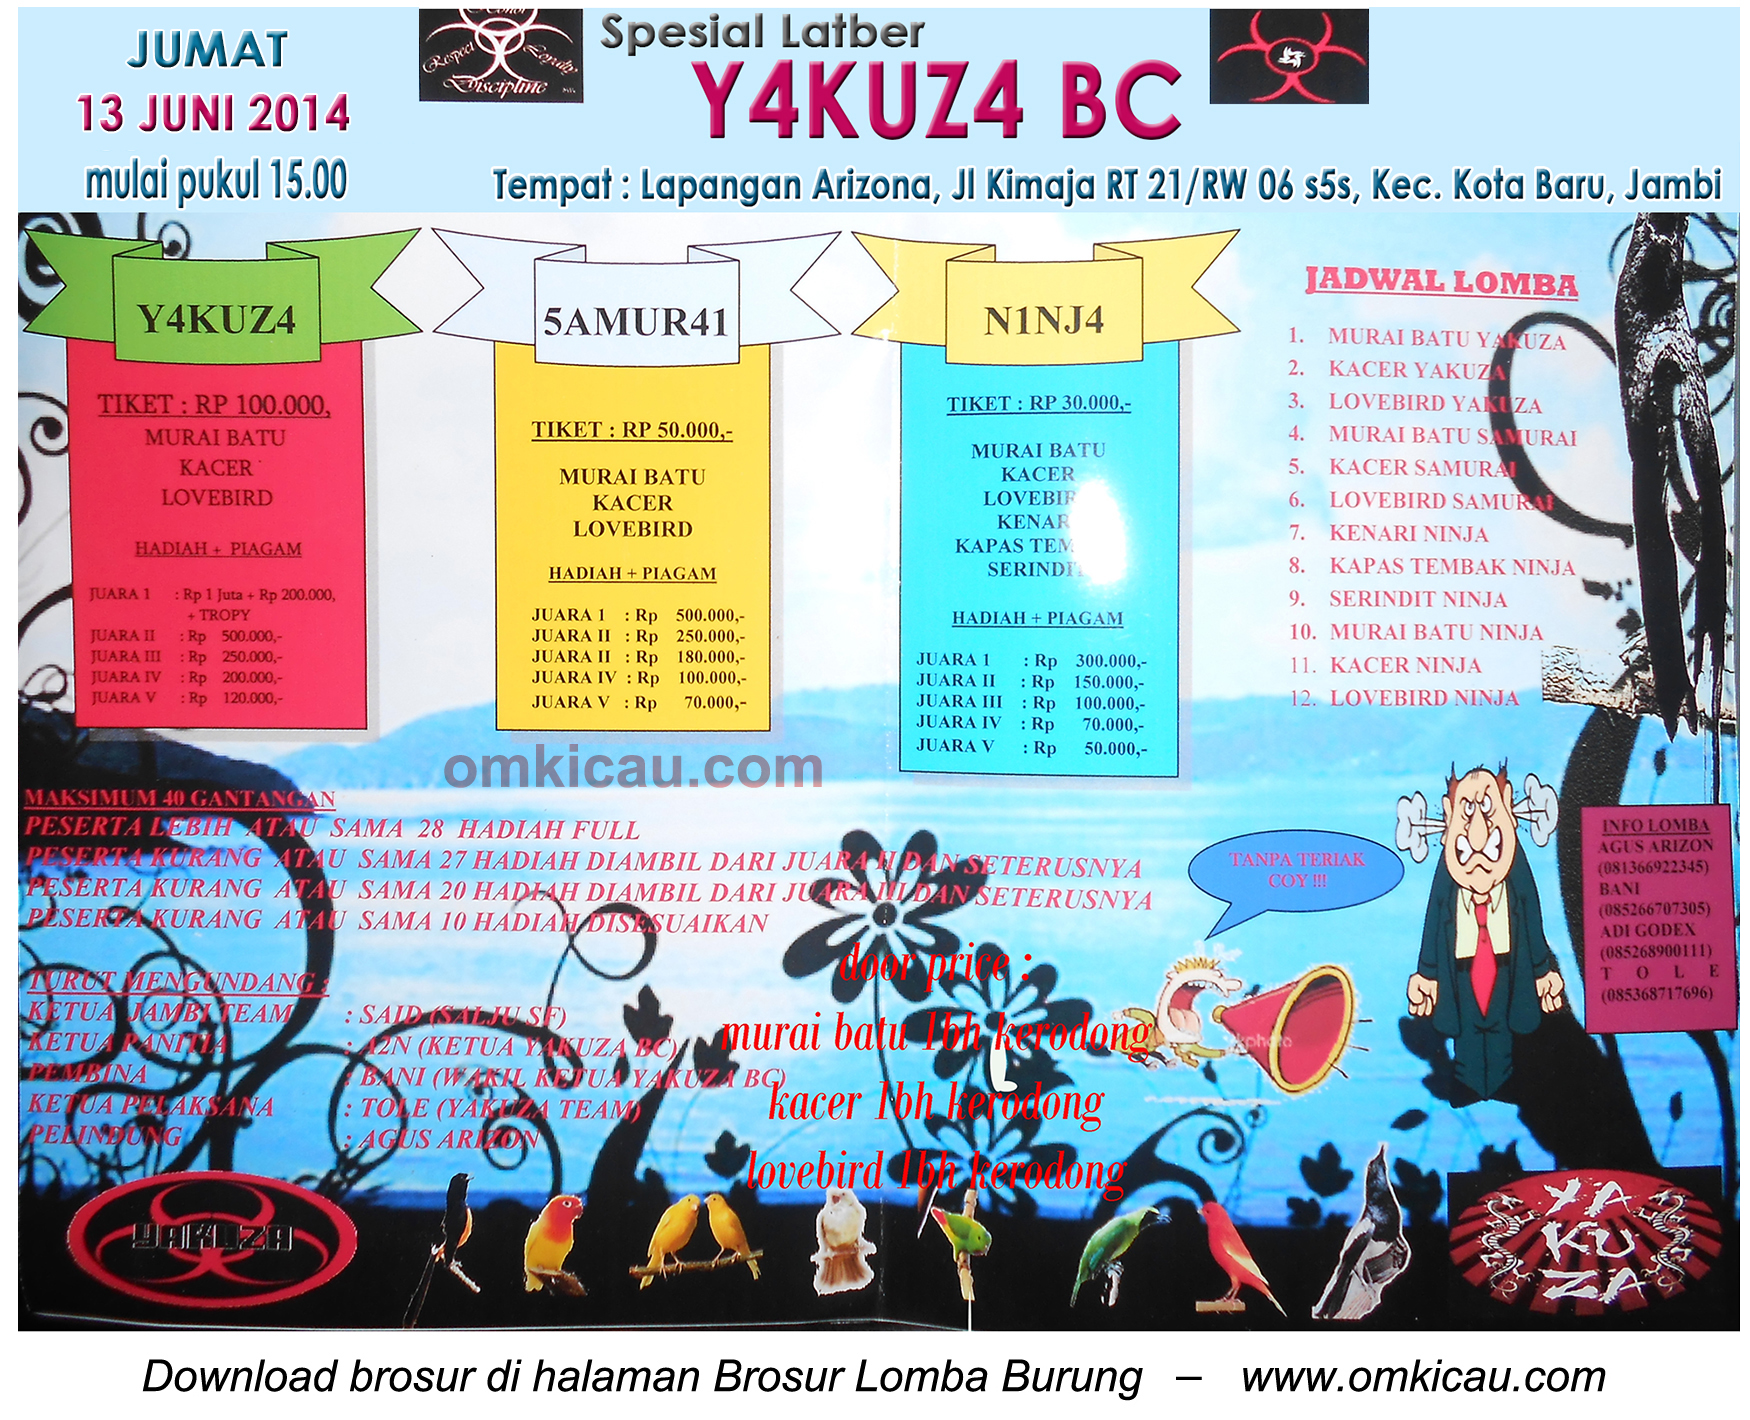 Latber Yakuza BC Jambi 13 Juni 2014